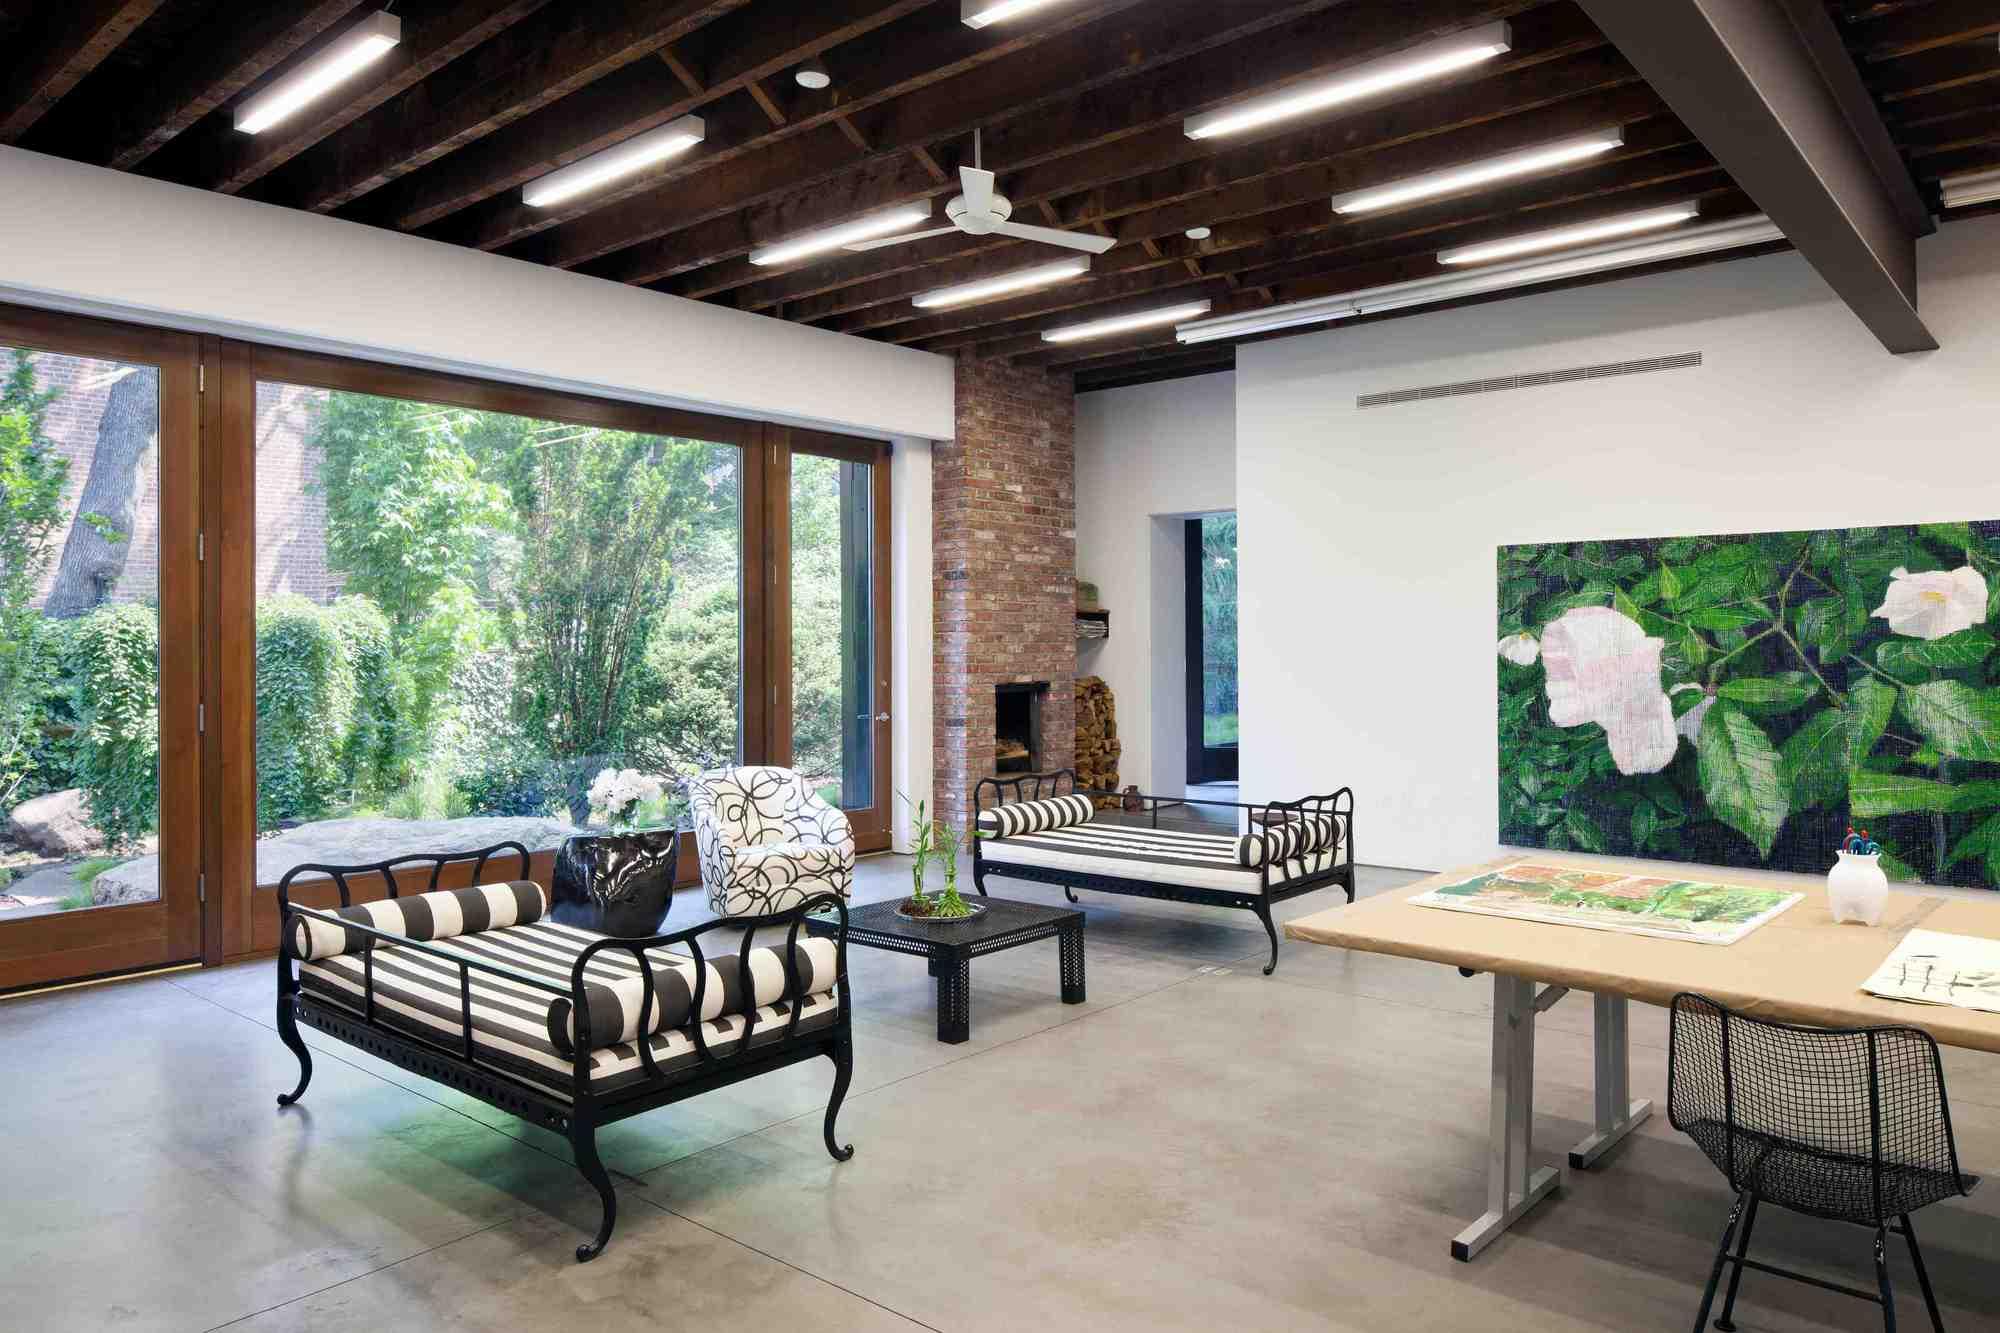 Brooklyn Studio by David Berridge Architect